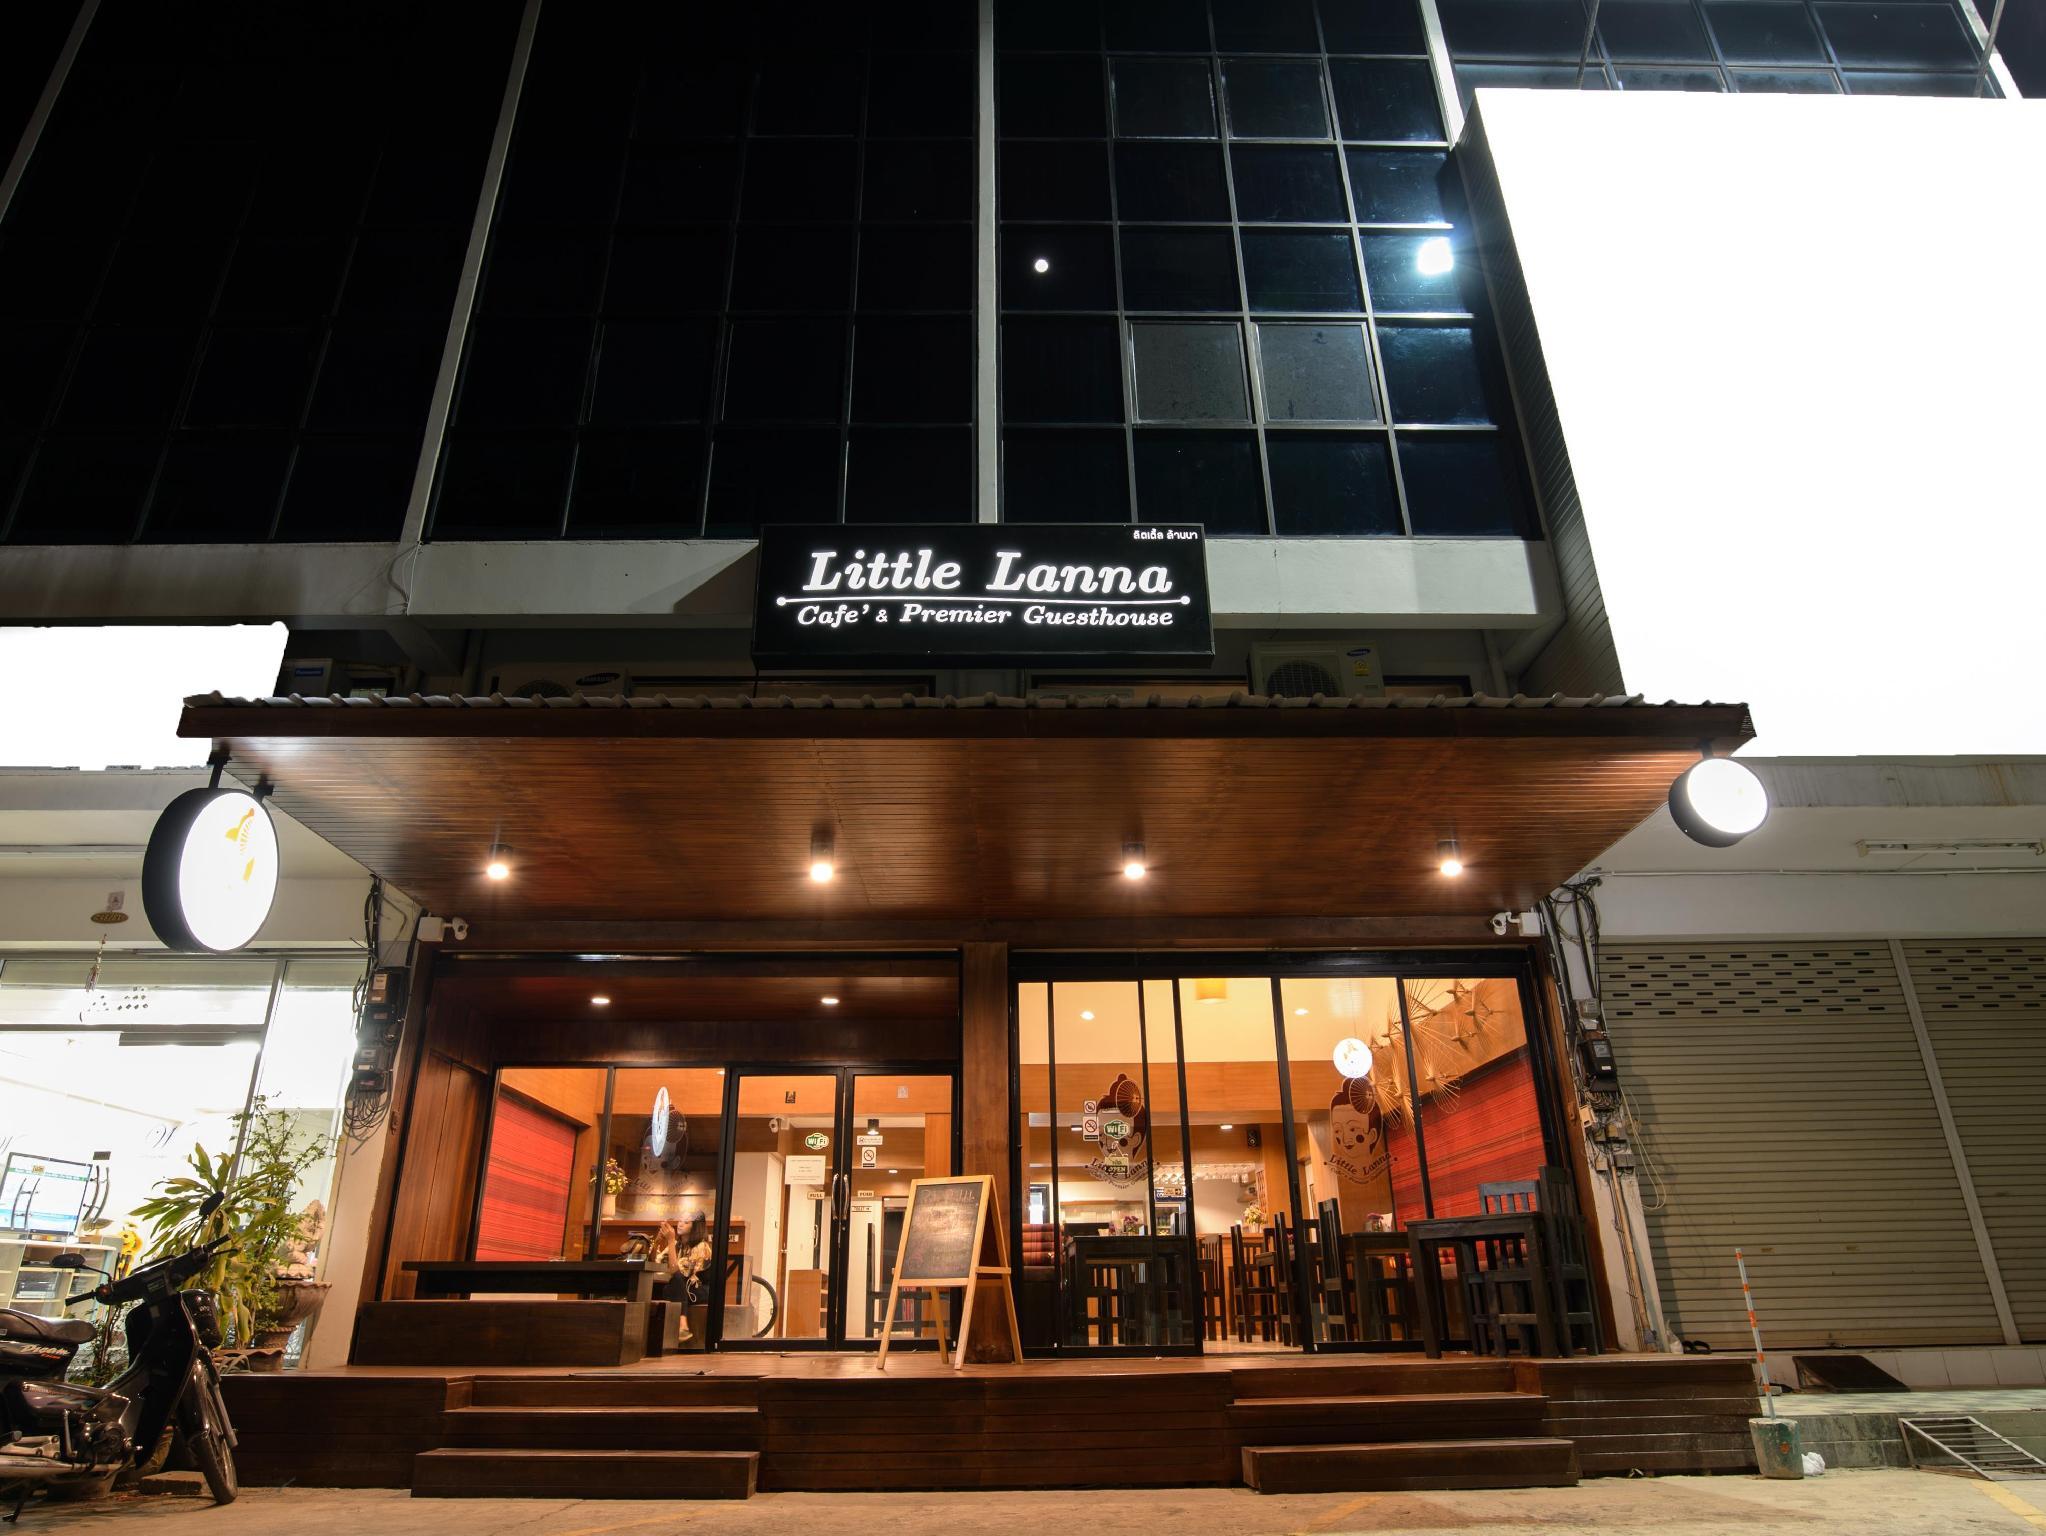 Little Lanna Cafe and Premier Guesthouse,ลิตเติ้ล ล้านนา คาเฟ่ แอนด์ พรีเมียร์ เกสเฮ้าส์